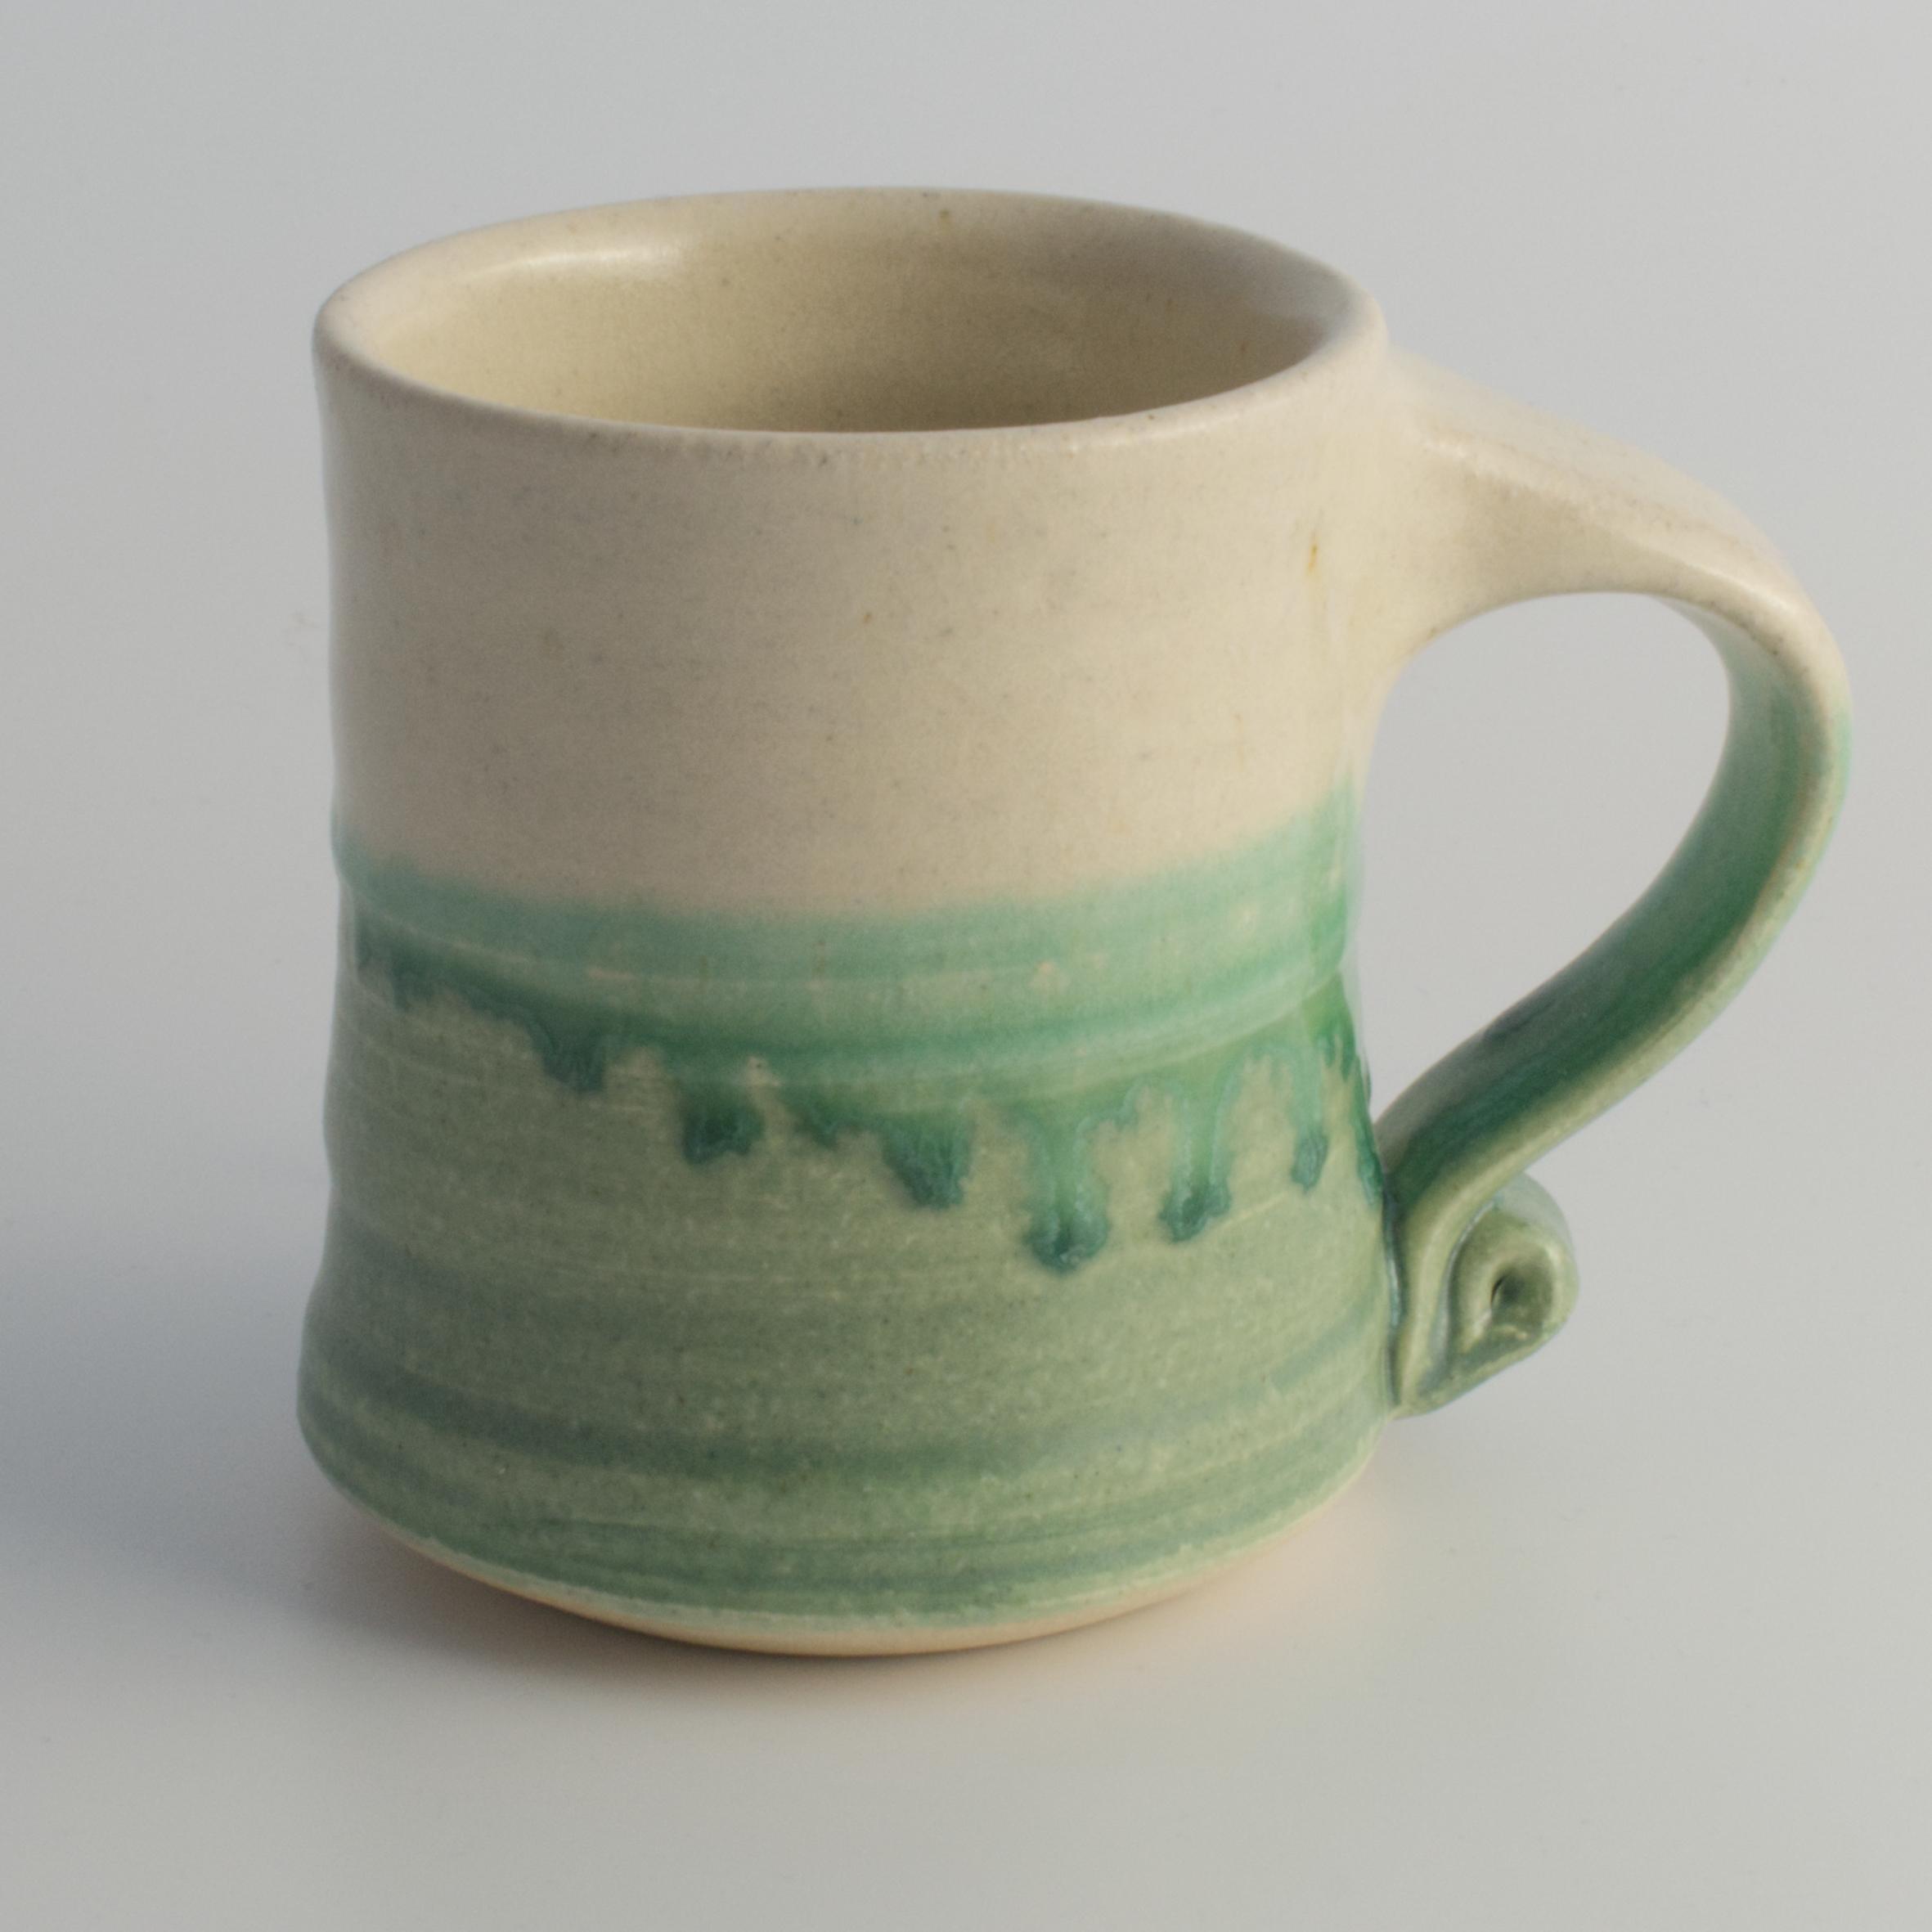 green & white ceramic mug